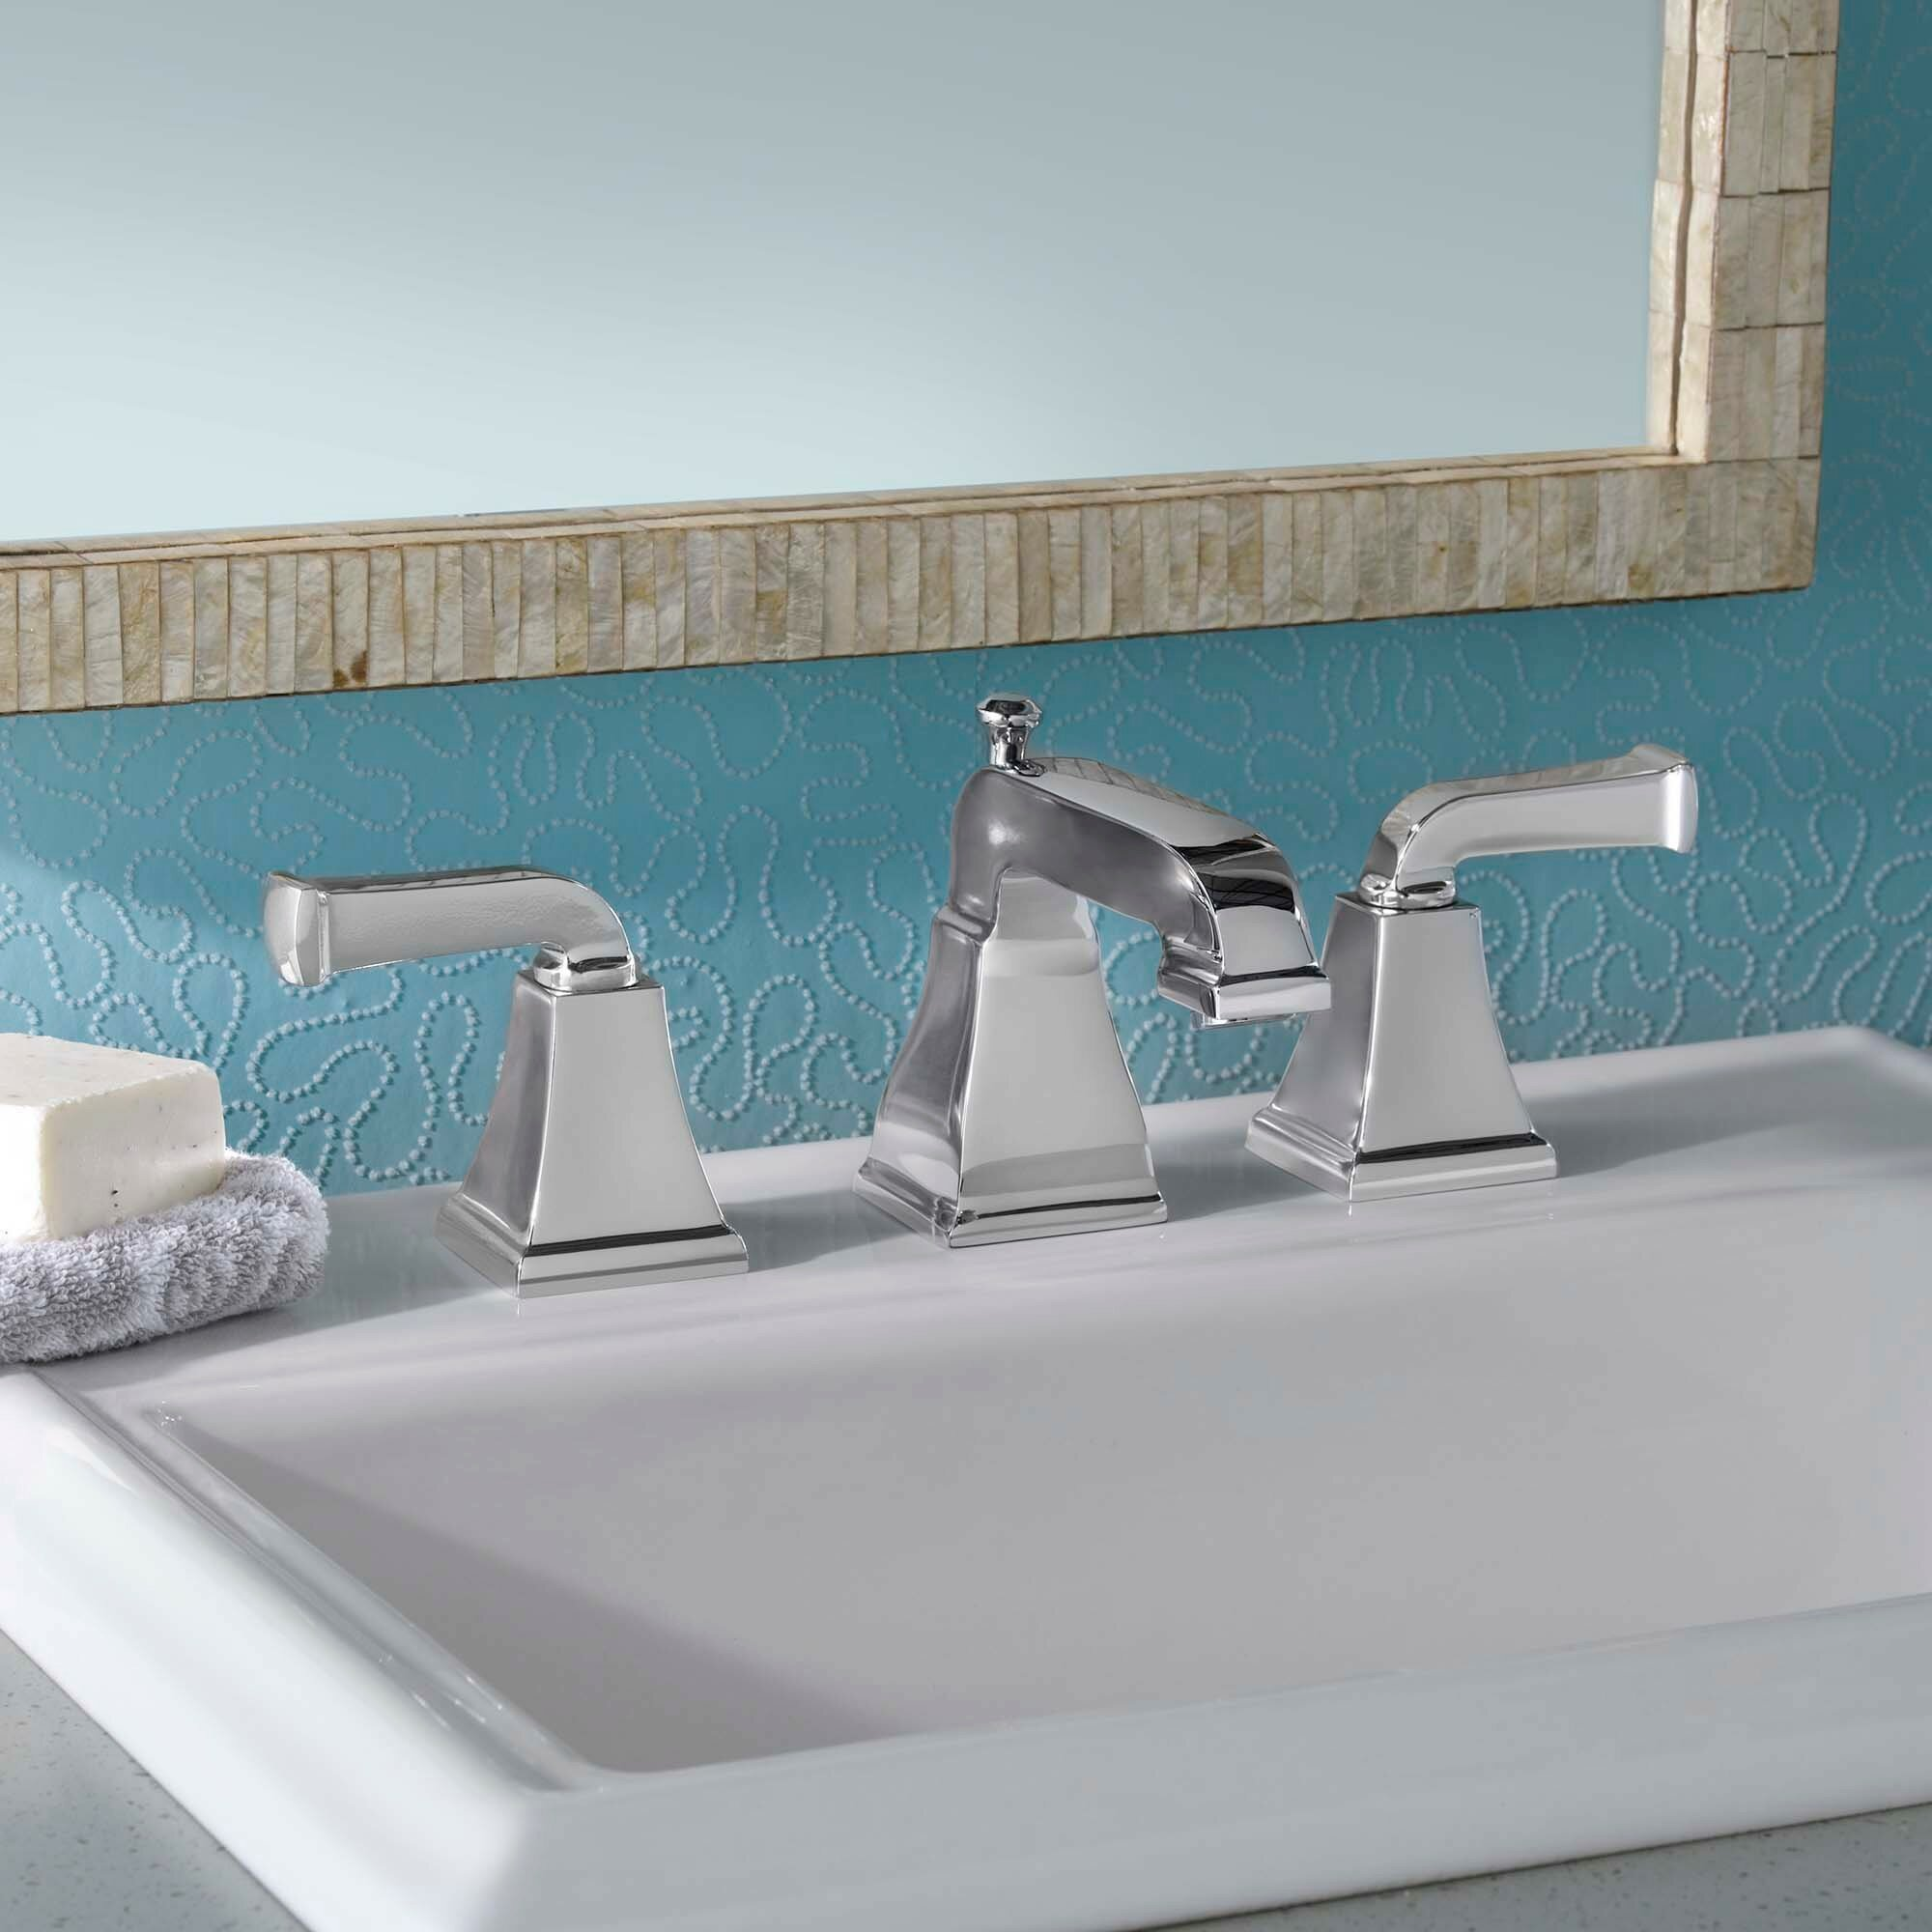 Magnificent Bathroom Faucet Sets Pattern - Faucet Collections ...